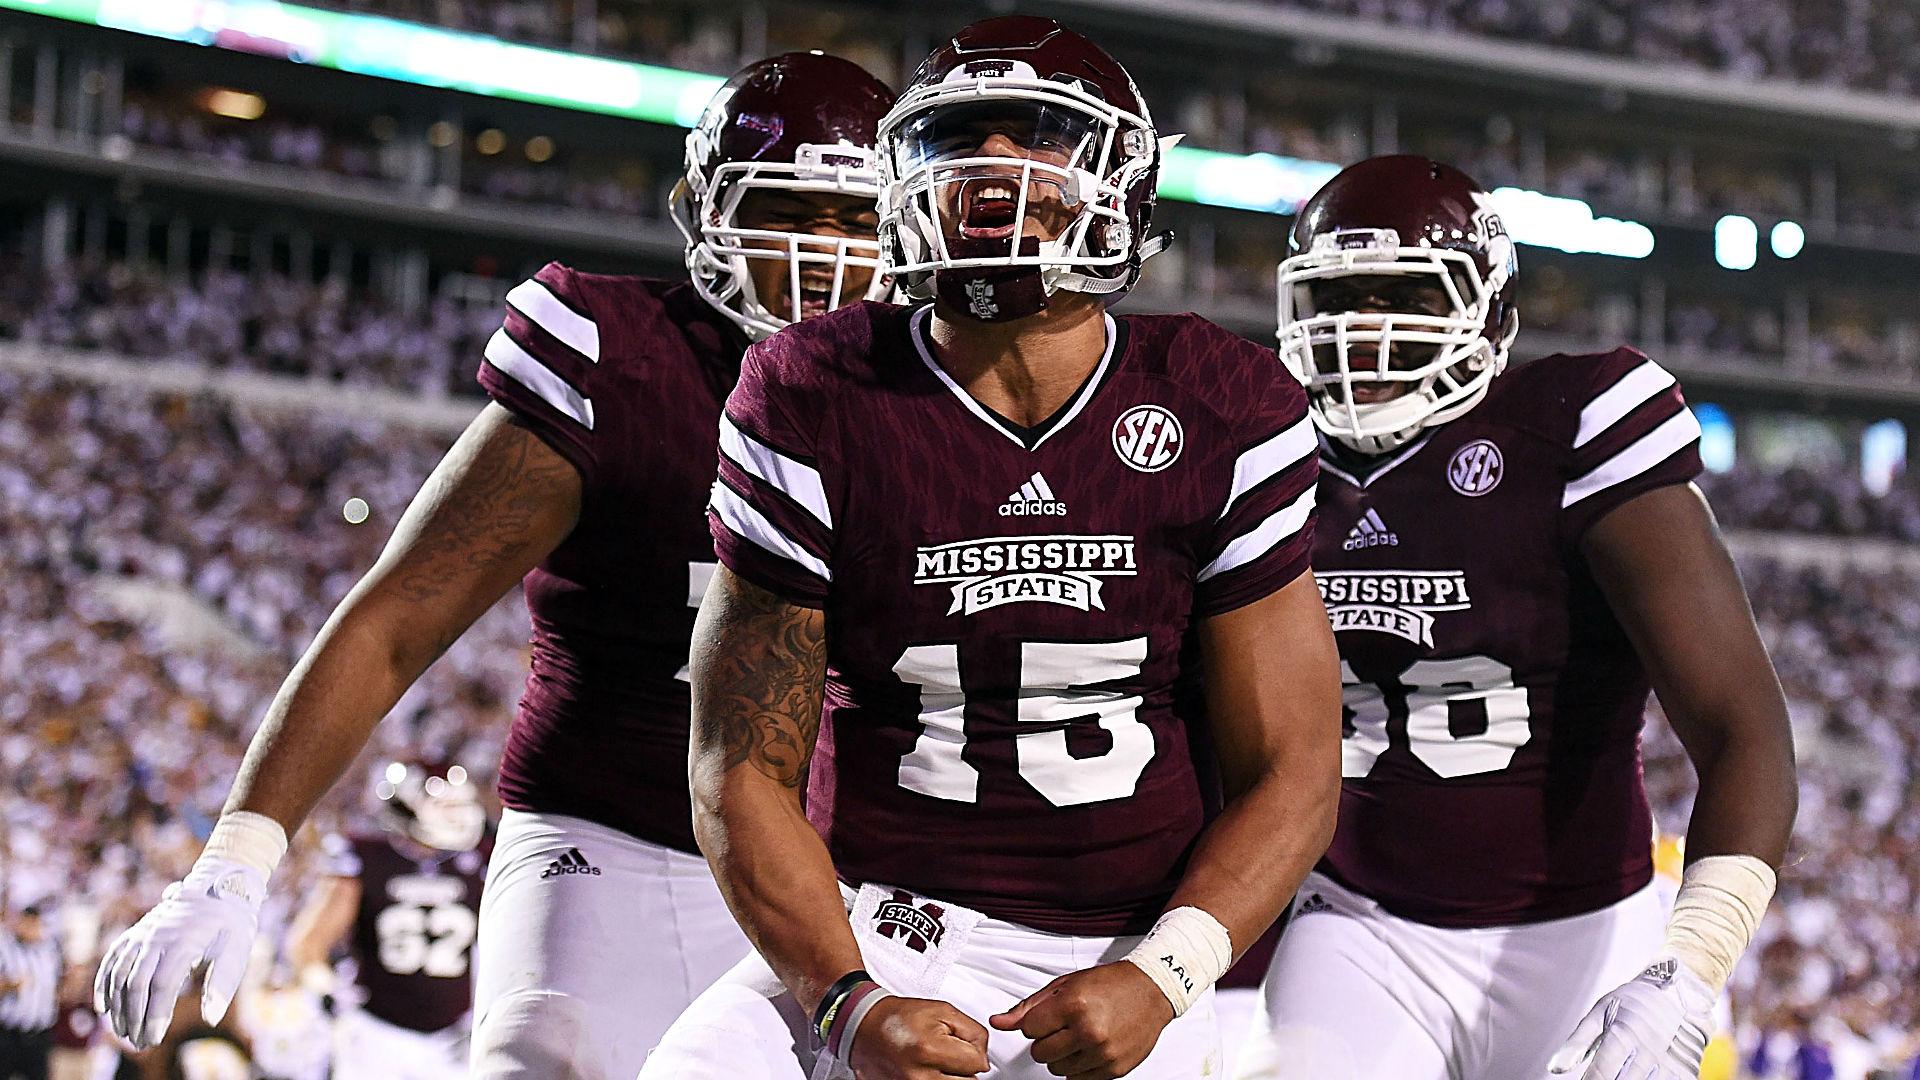 Mississippi State Bulldogs football - Wikipedia